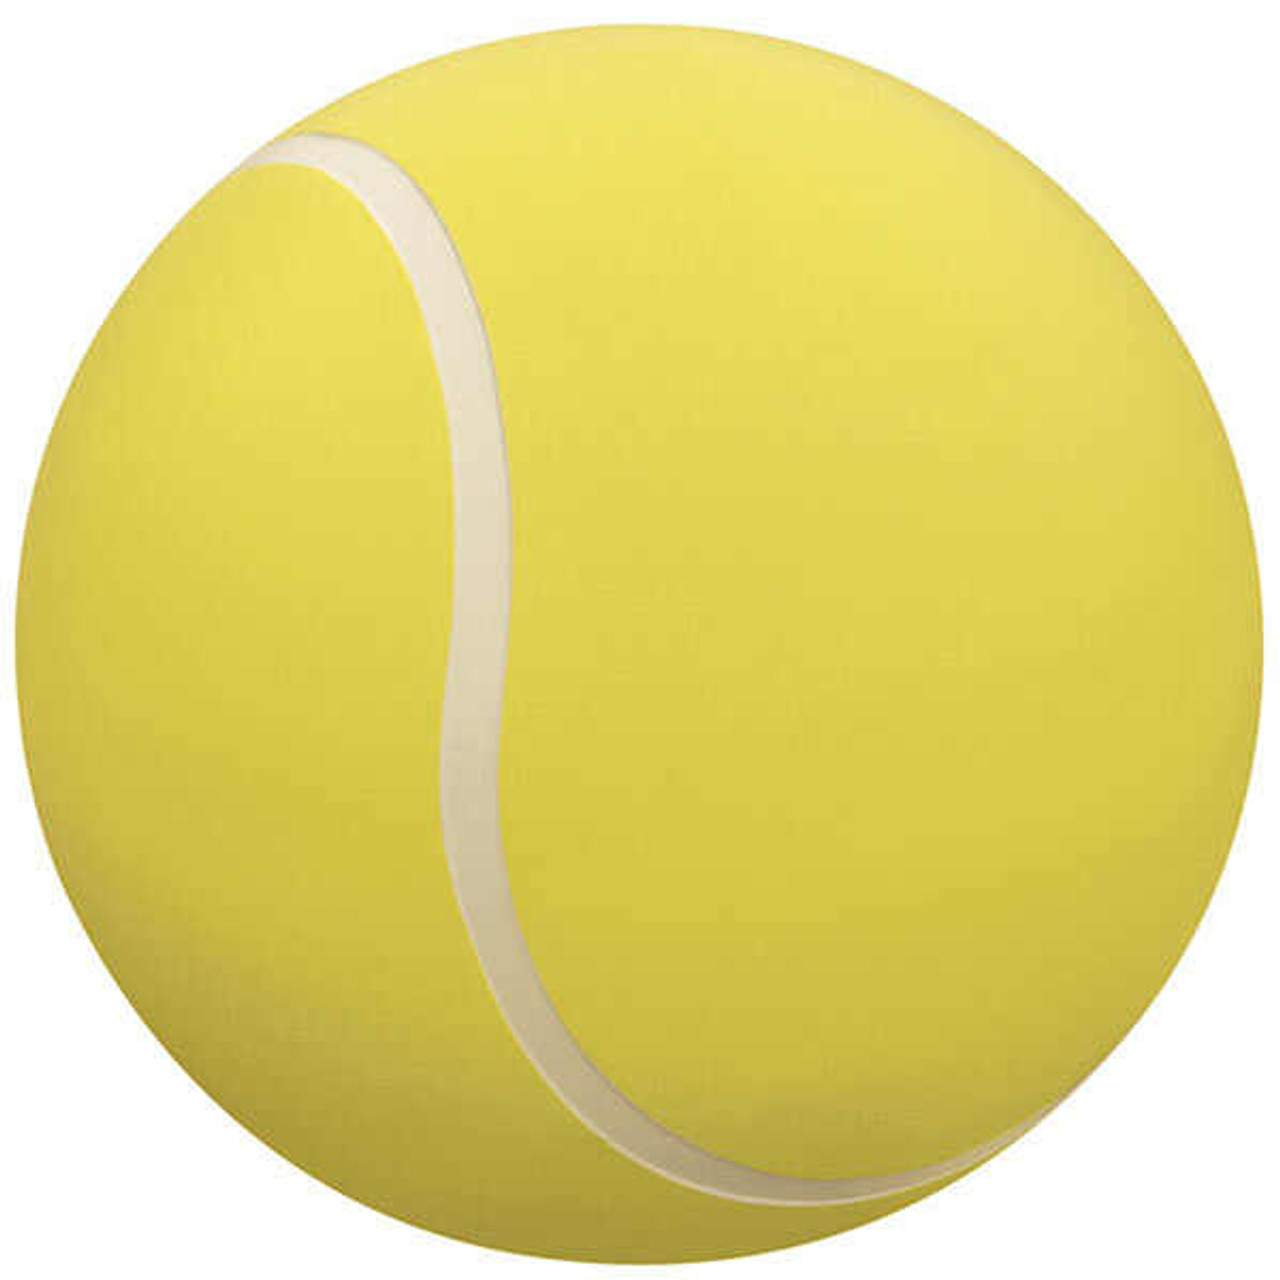 24 Inch Tennis Ball Bollard Safety Barrier Sphere TF6213